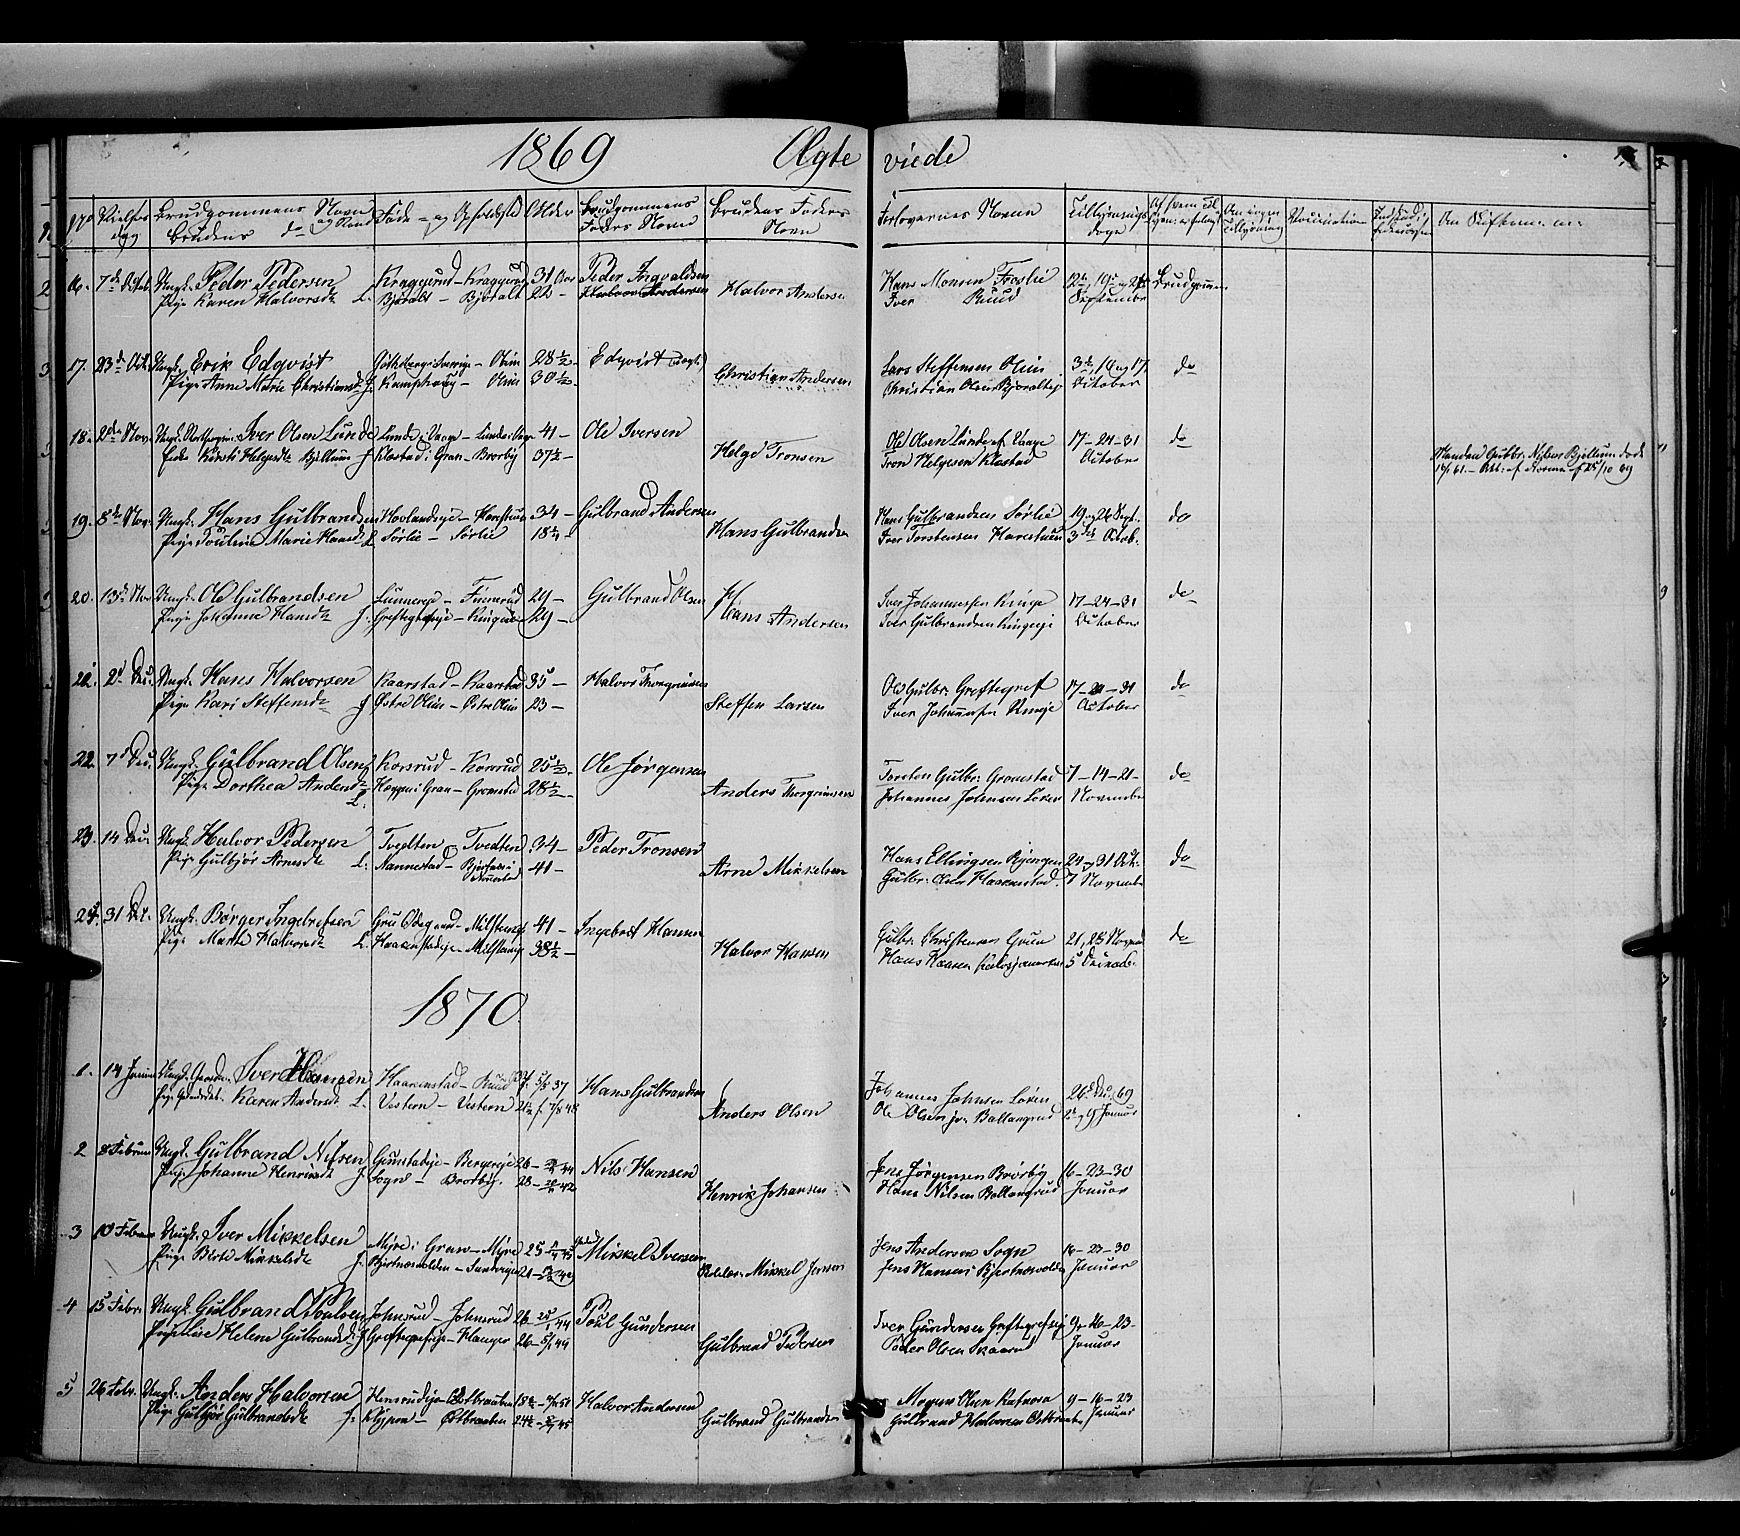 SAH, Jevnaker prestekontor, Ministerialbok nr. 7, 1858-1876, s. 196